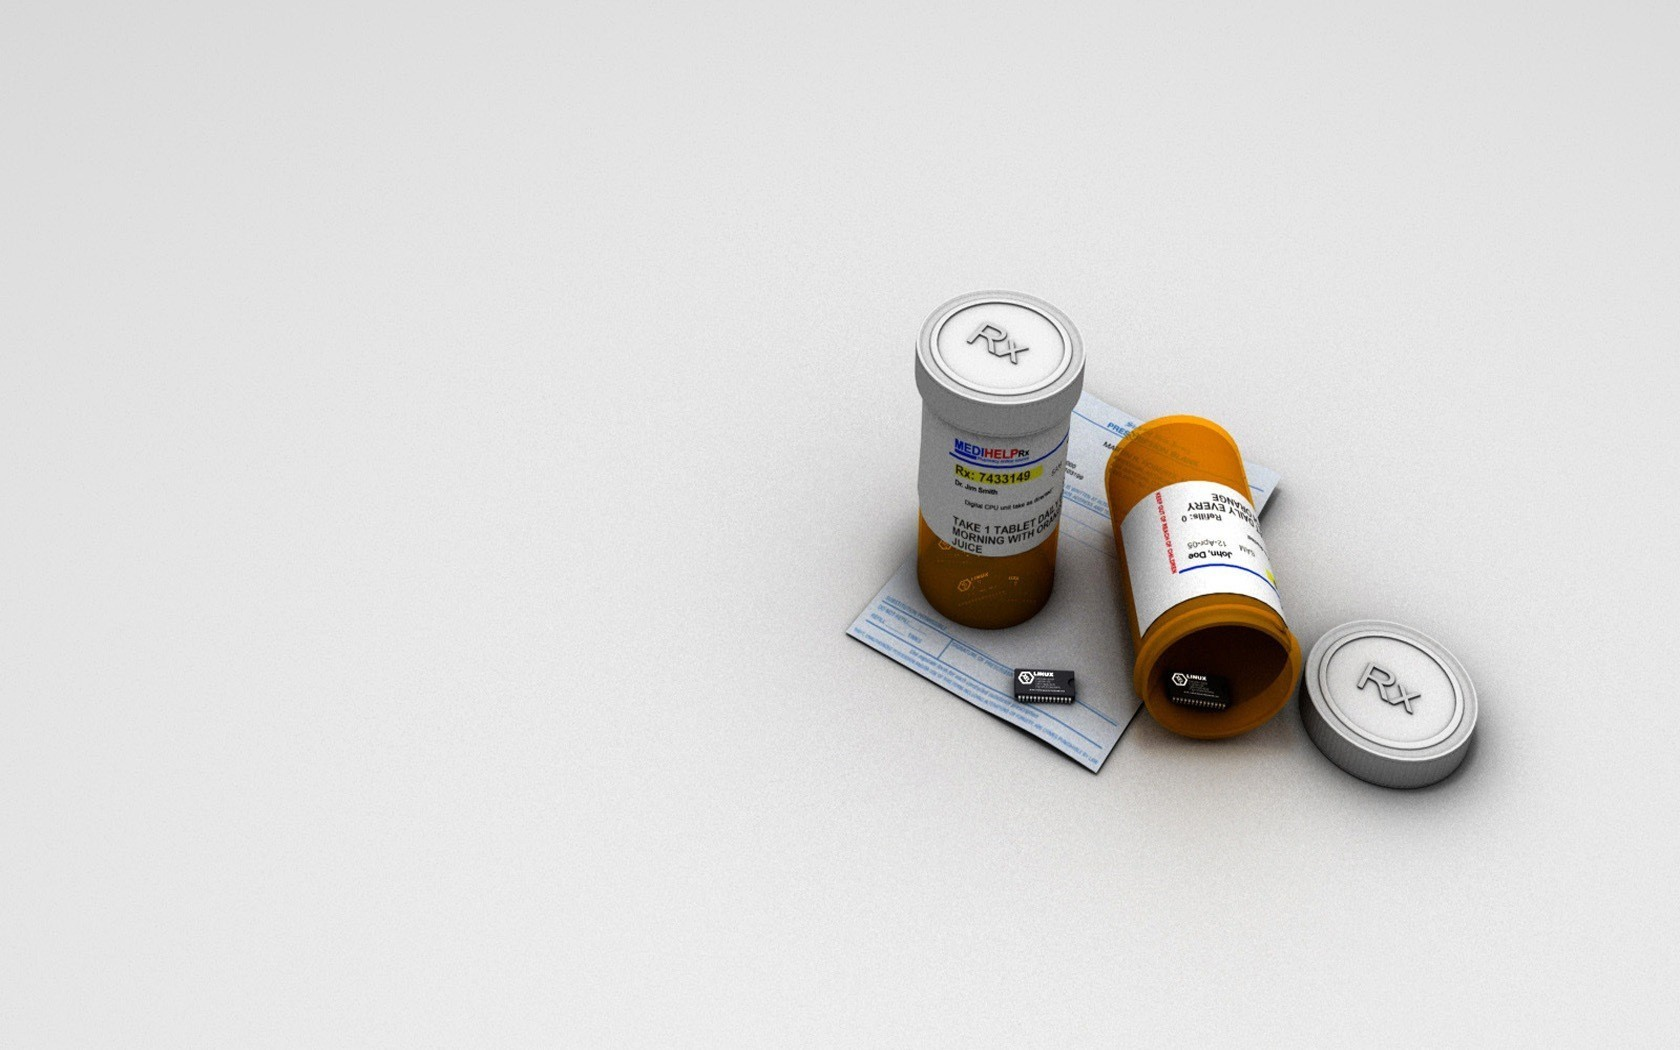 Download Minimalistic Medicine Wallpaper 1680x1050 Wallpoper 337517 1680x1050